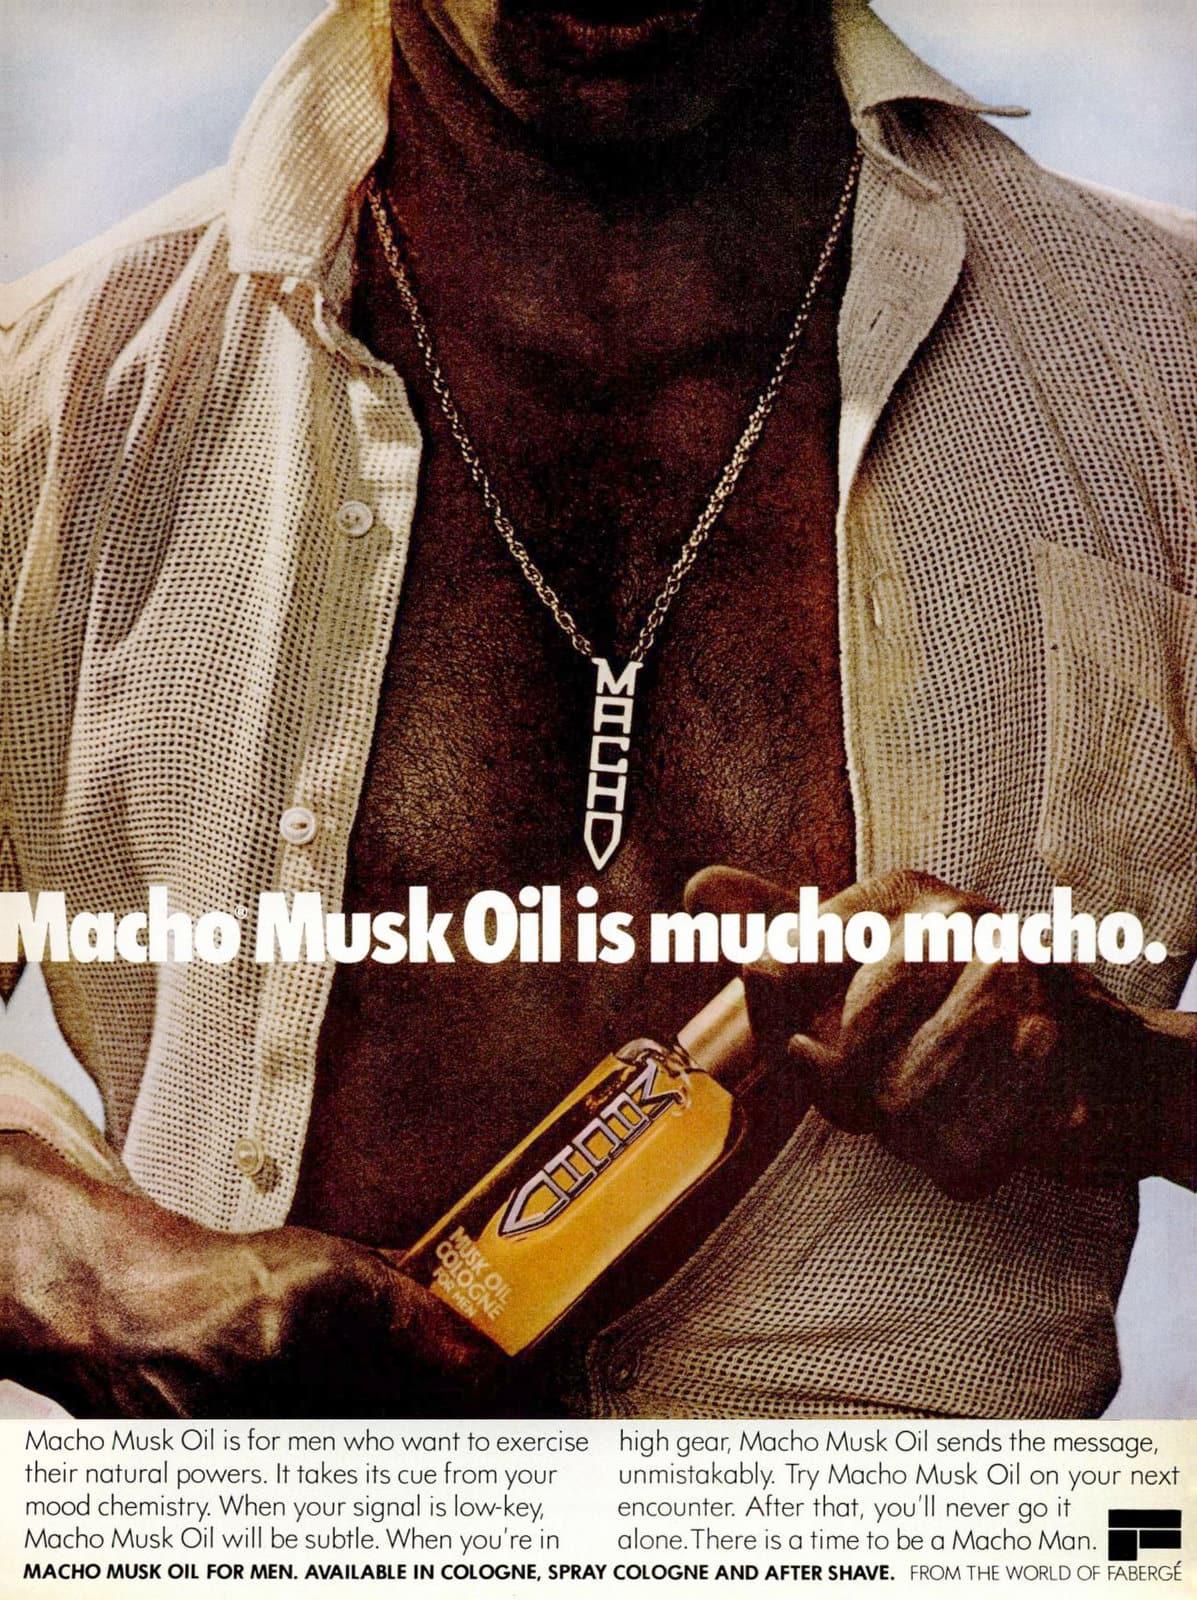 Retro Macho Musk Oil for men (1978)